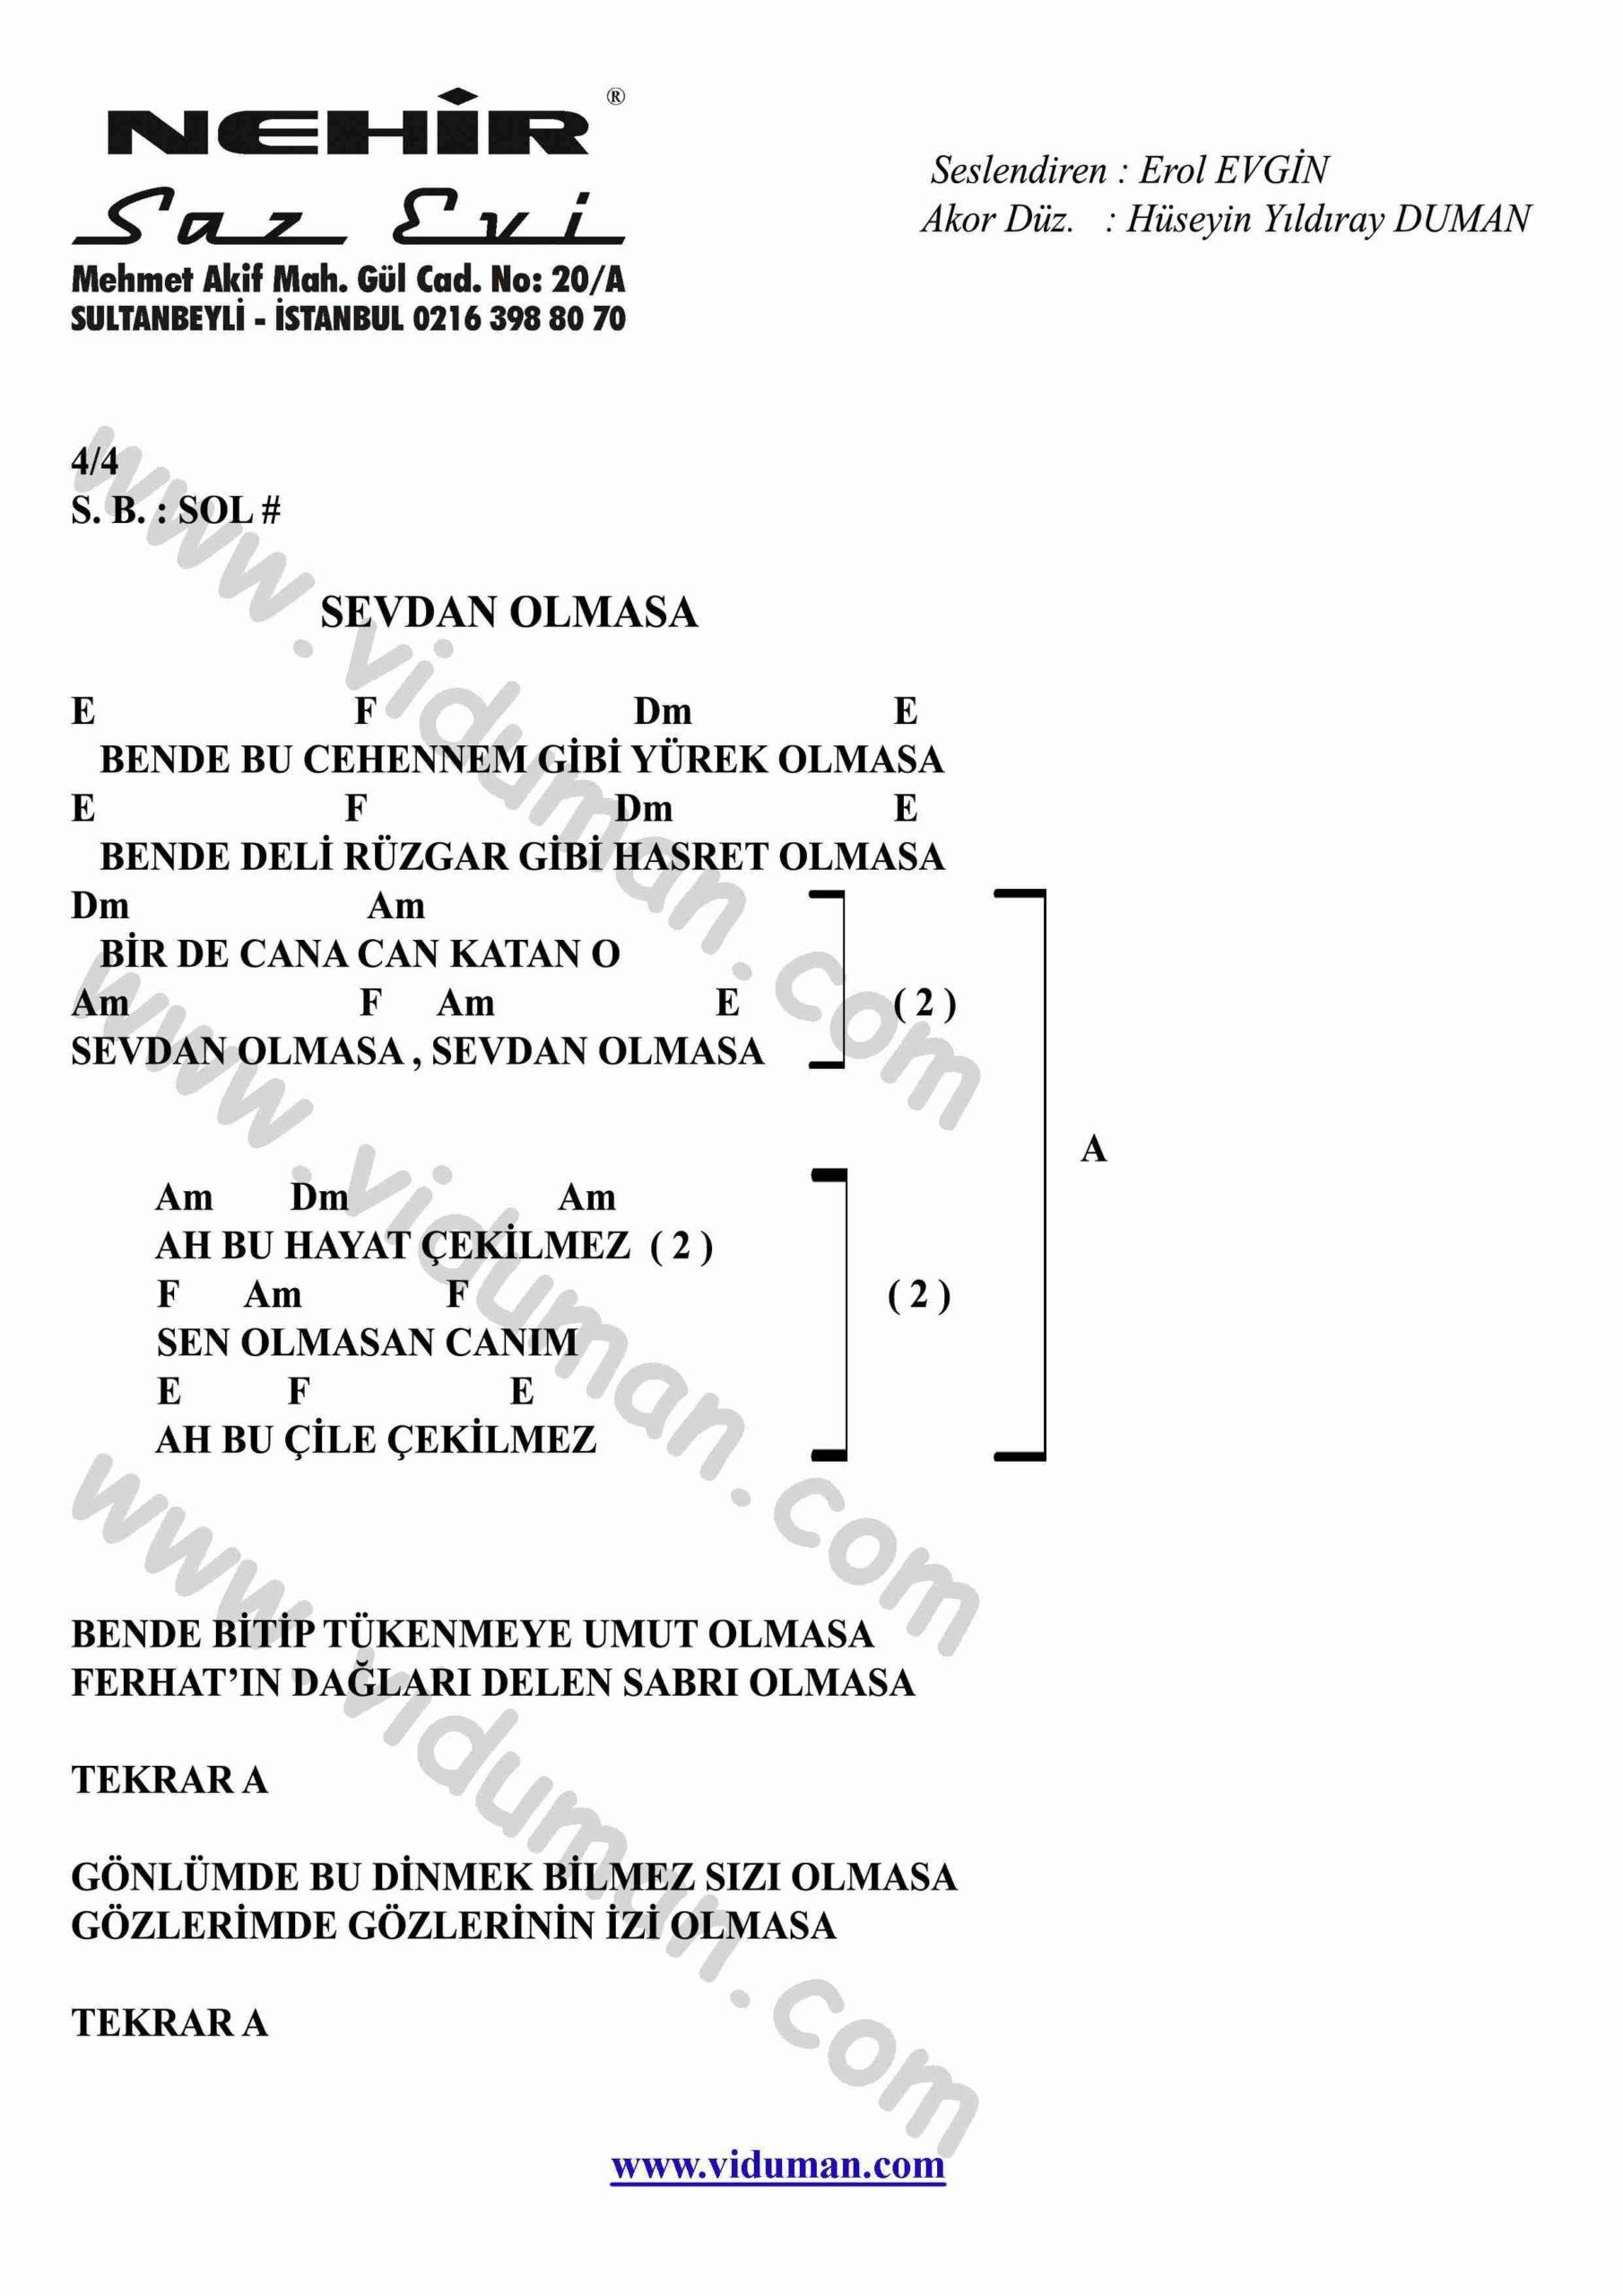 Sevdan Olmasa-Gitar-Ritim-Akorlari